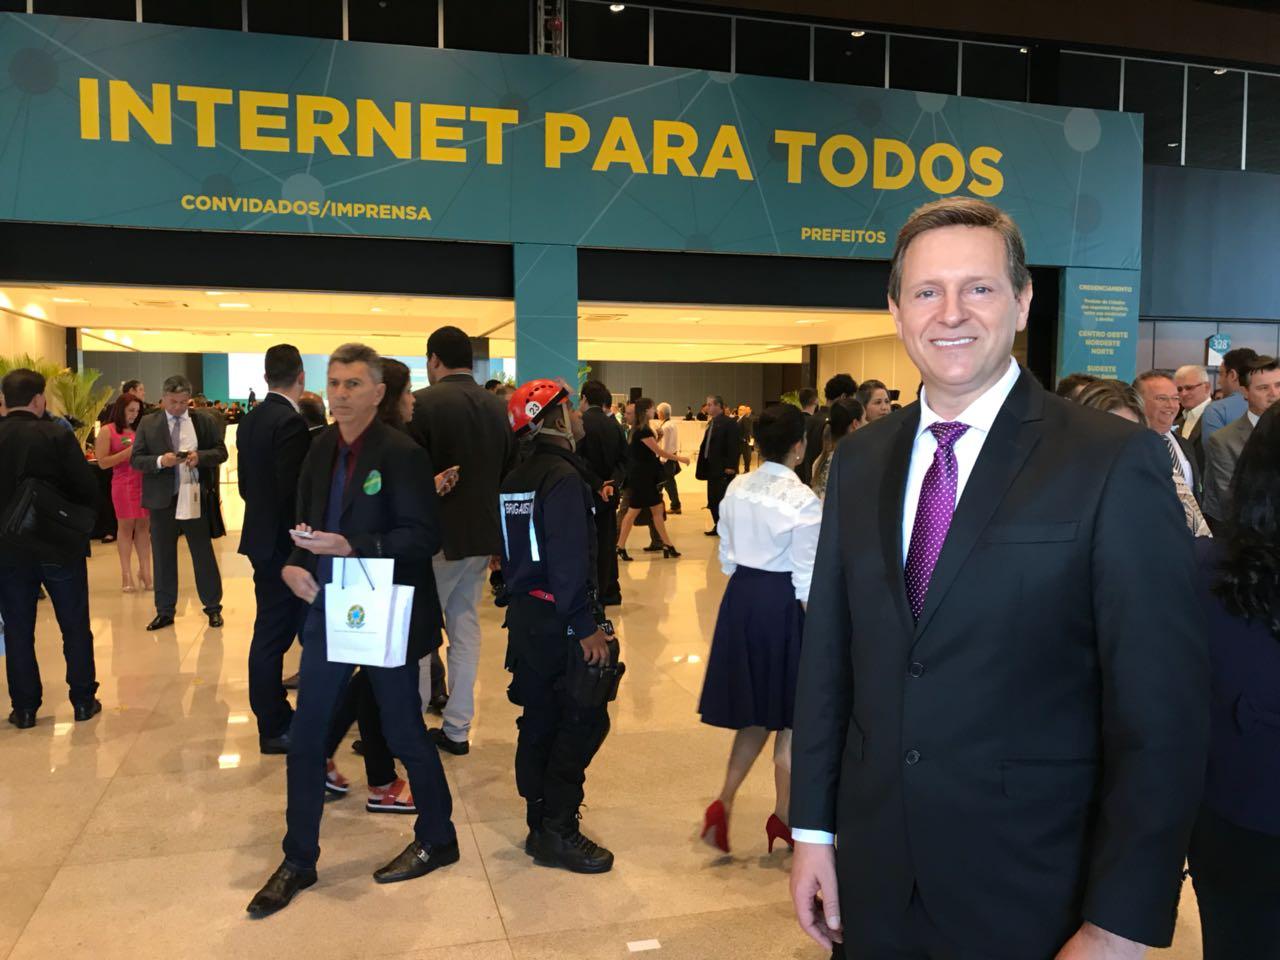 Heliton do Valle conquista internet à zona rural de Itararé (SP)